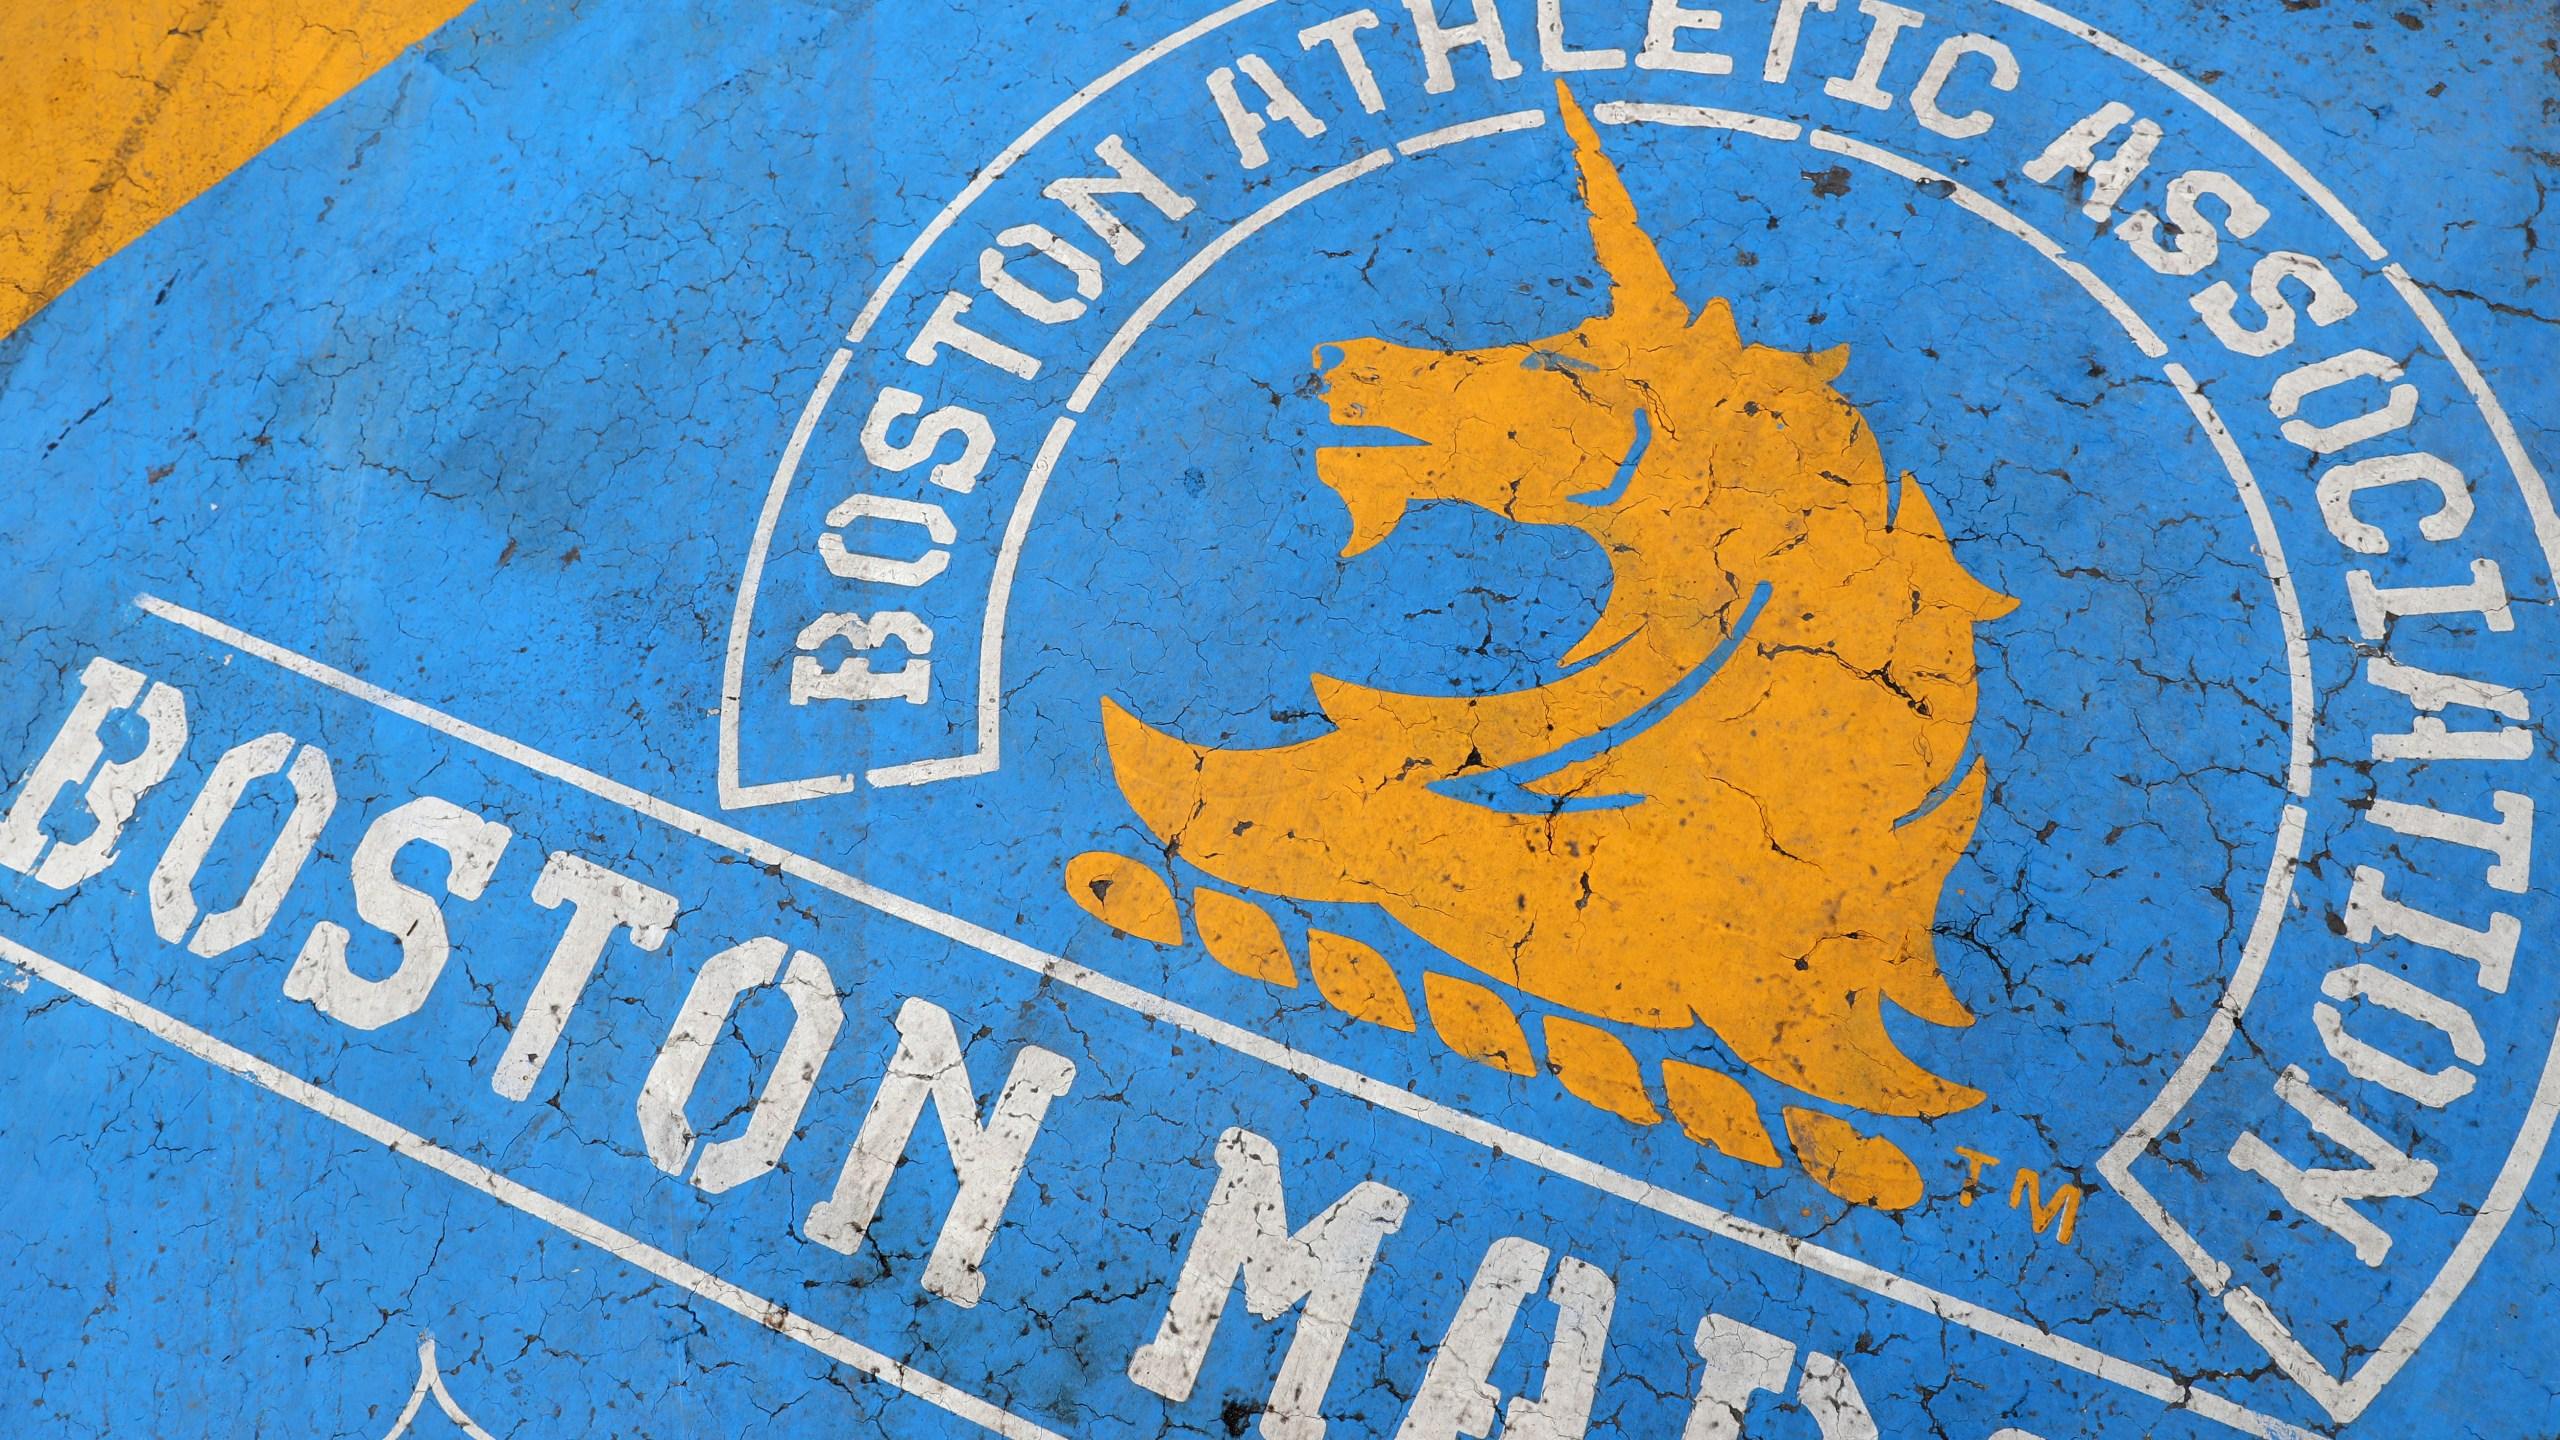 The Boston Marathon finish line. (Photo by Maddie Meyer/Getty Images)